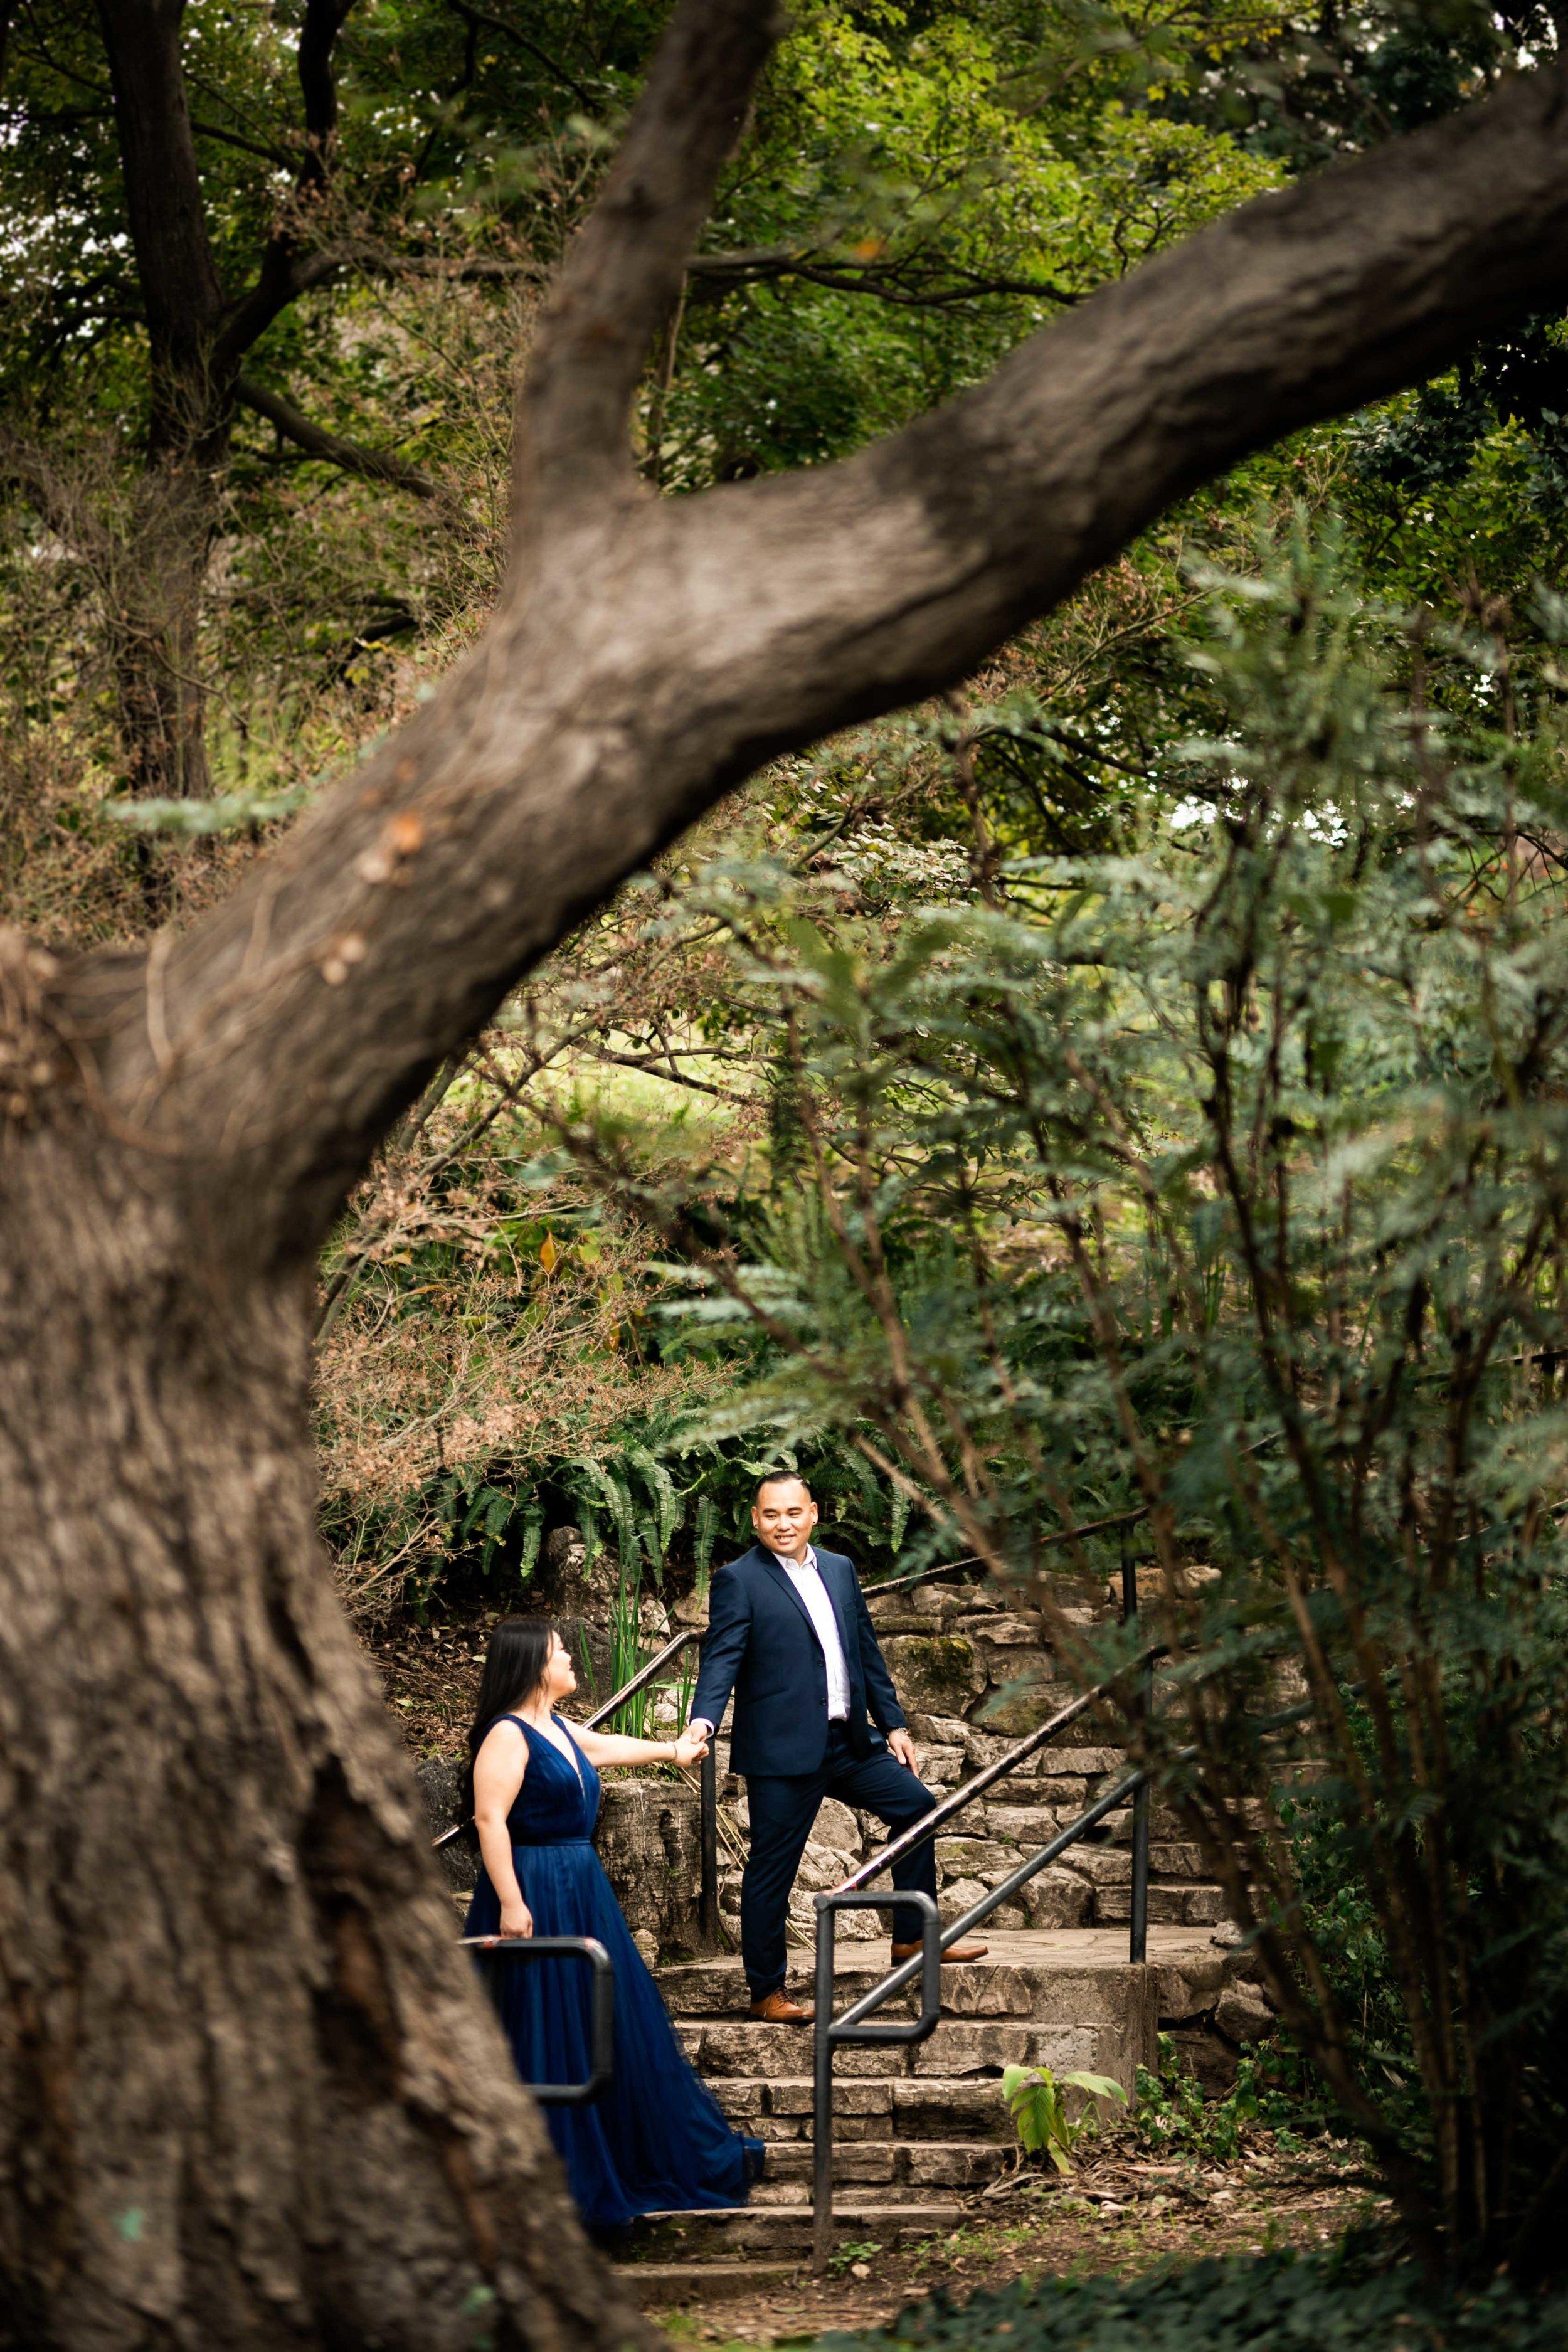 los_angeles_arboretum_engagement_joshuachun_photography_-8.JPG